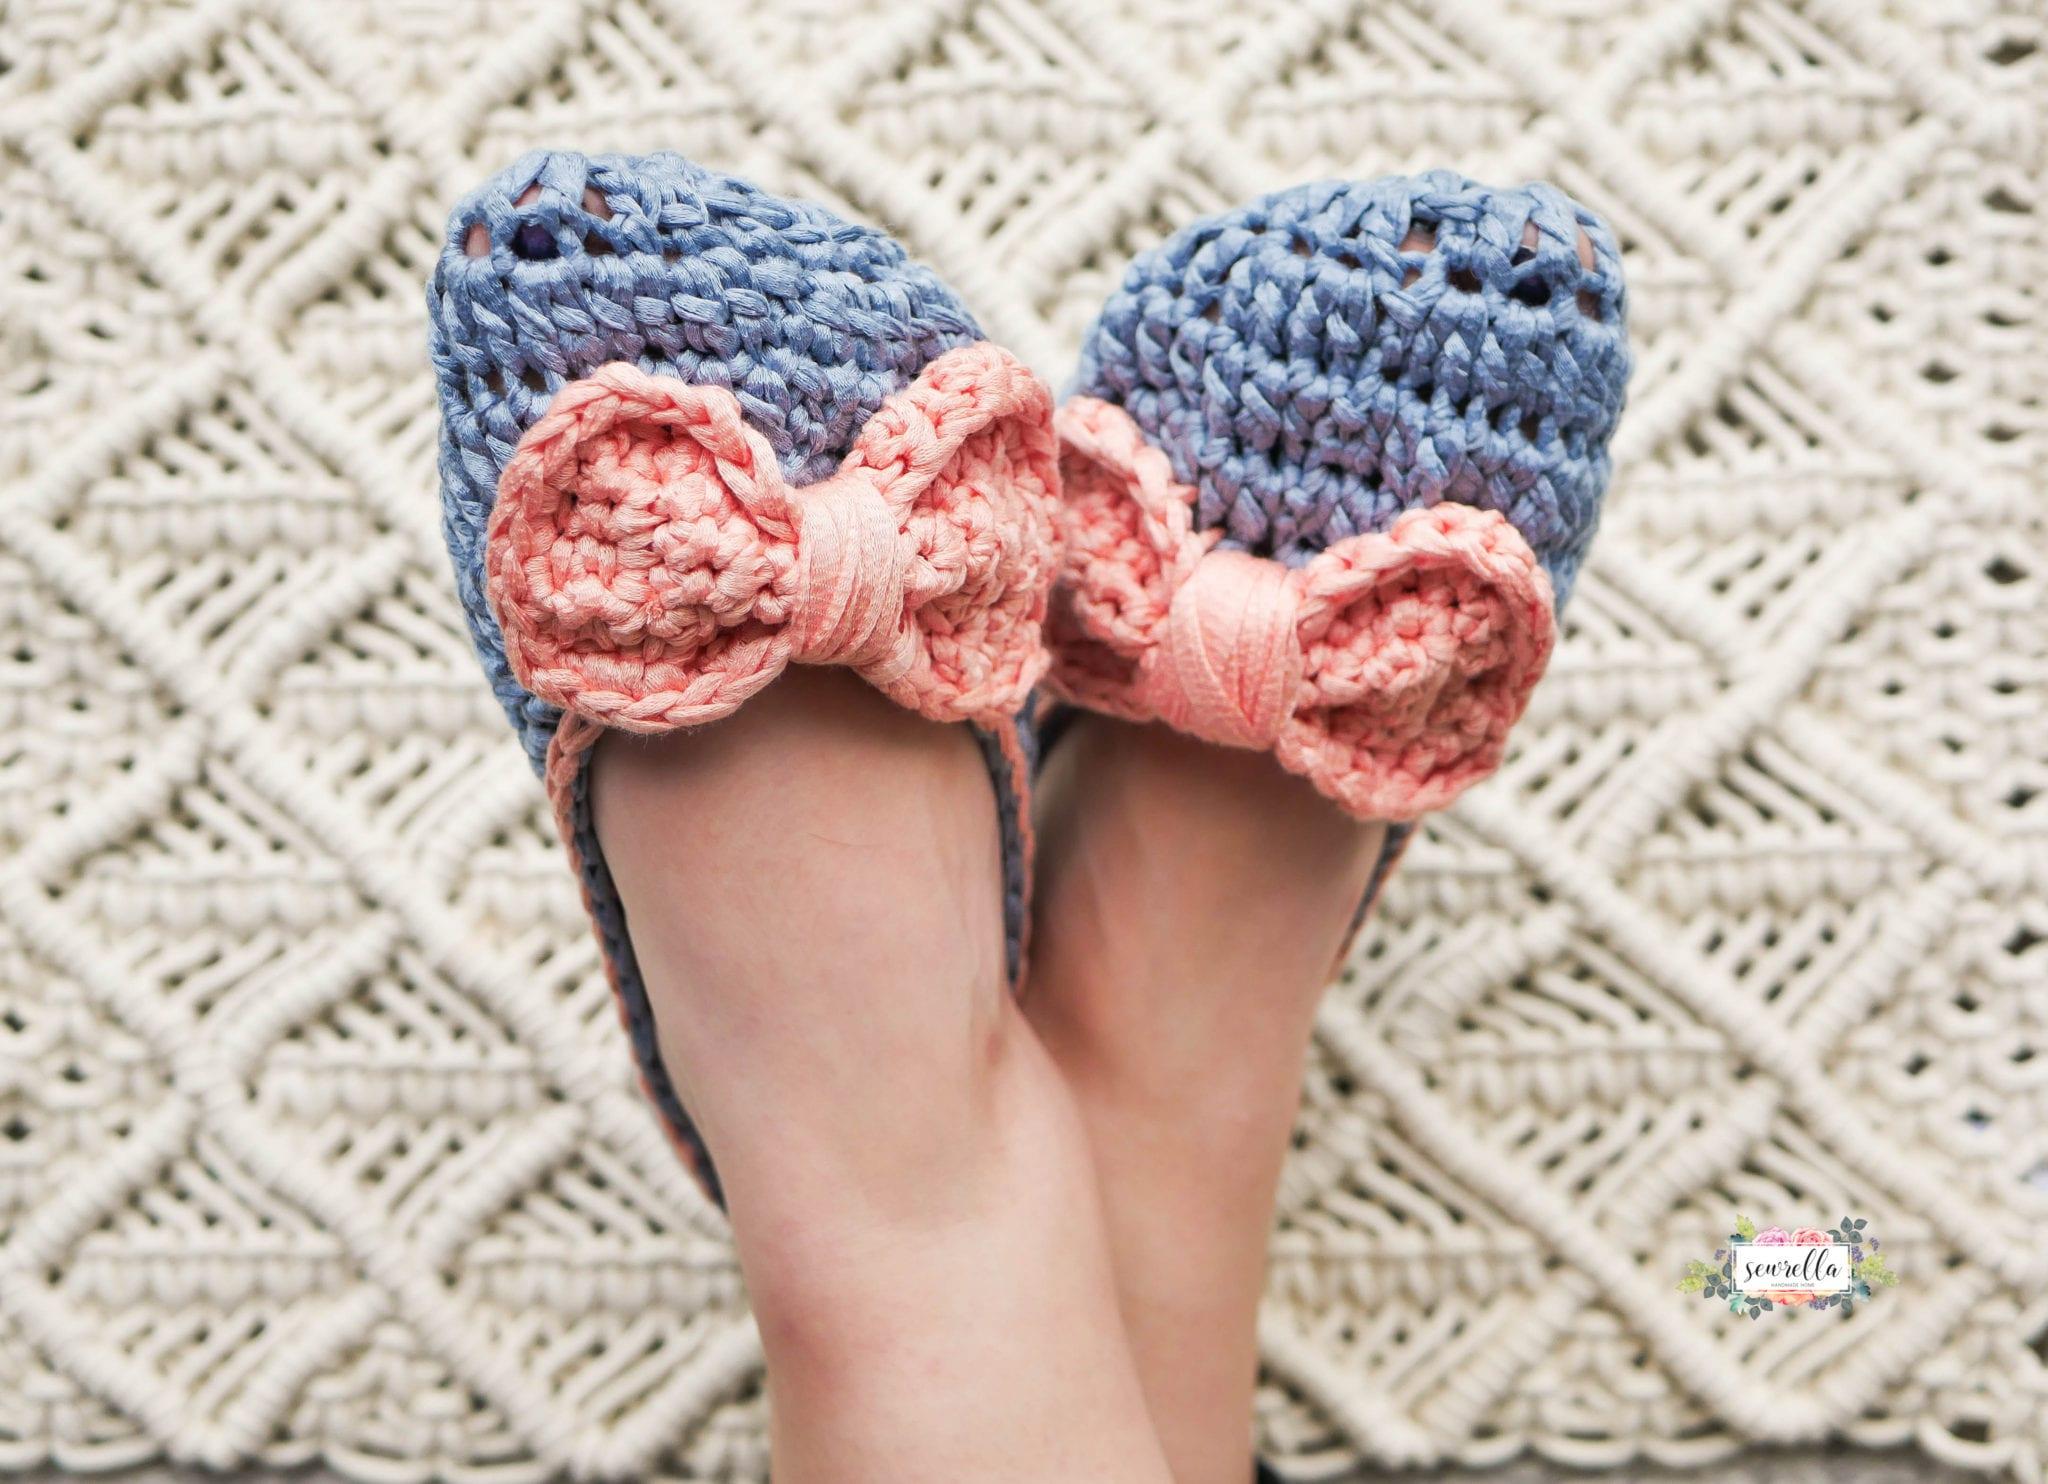 Crochet Ophelia House Slippers - Sewrella